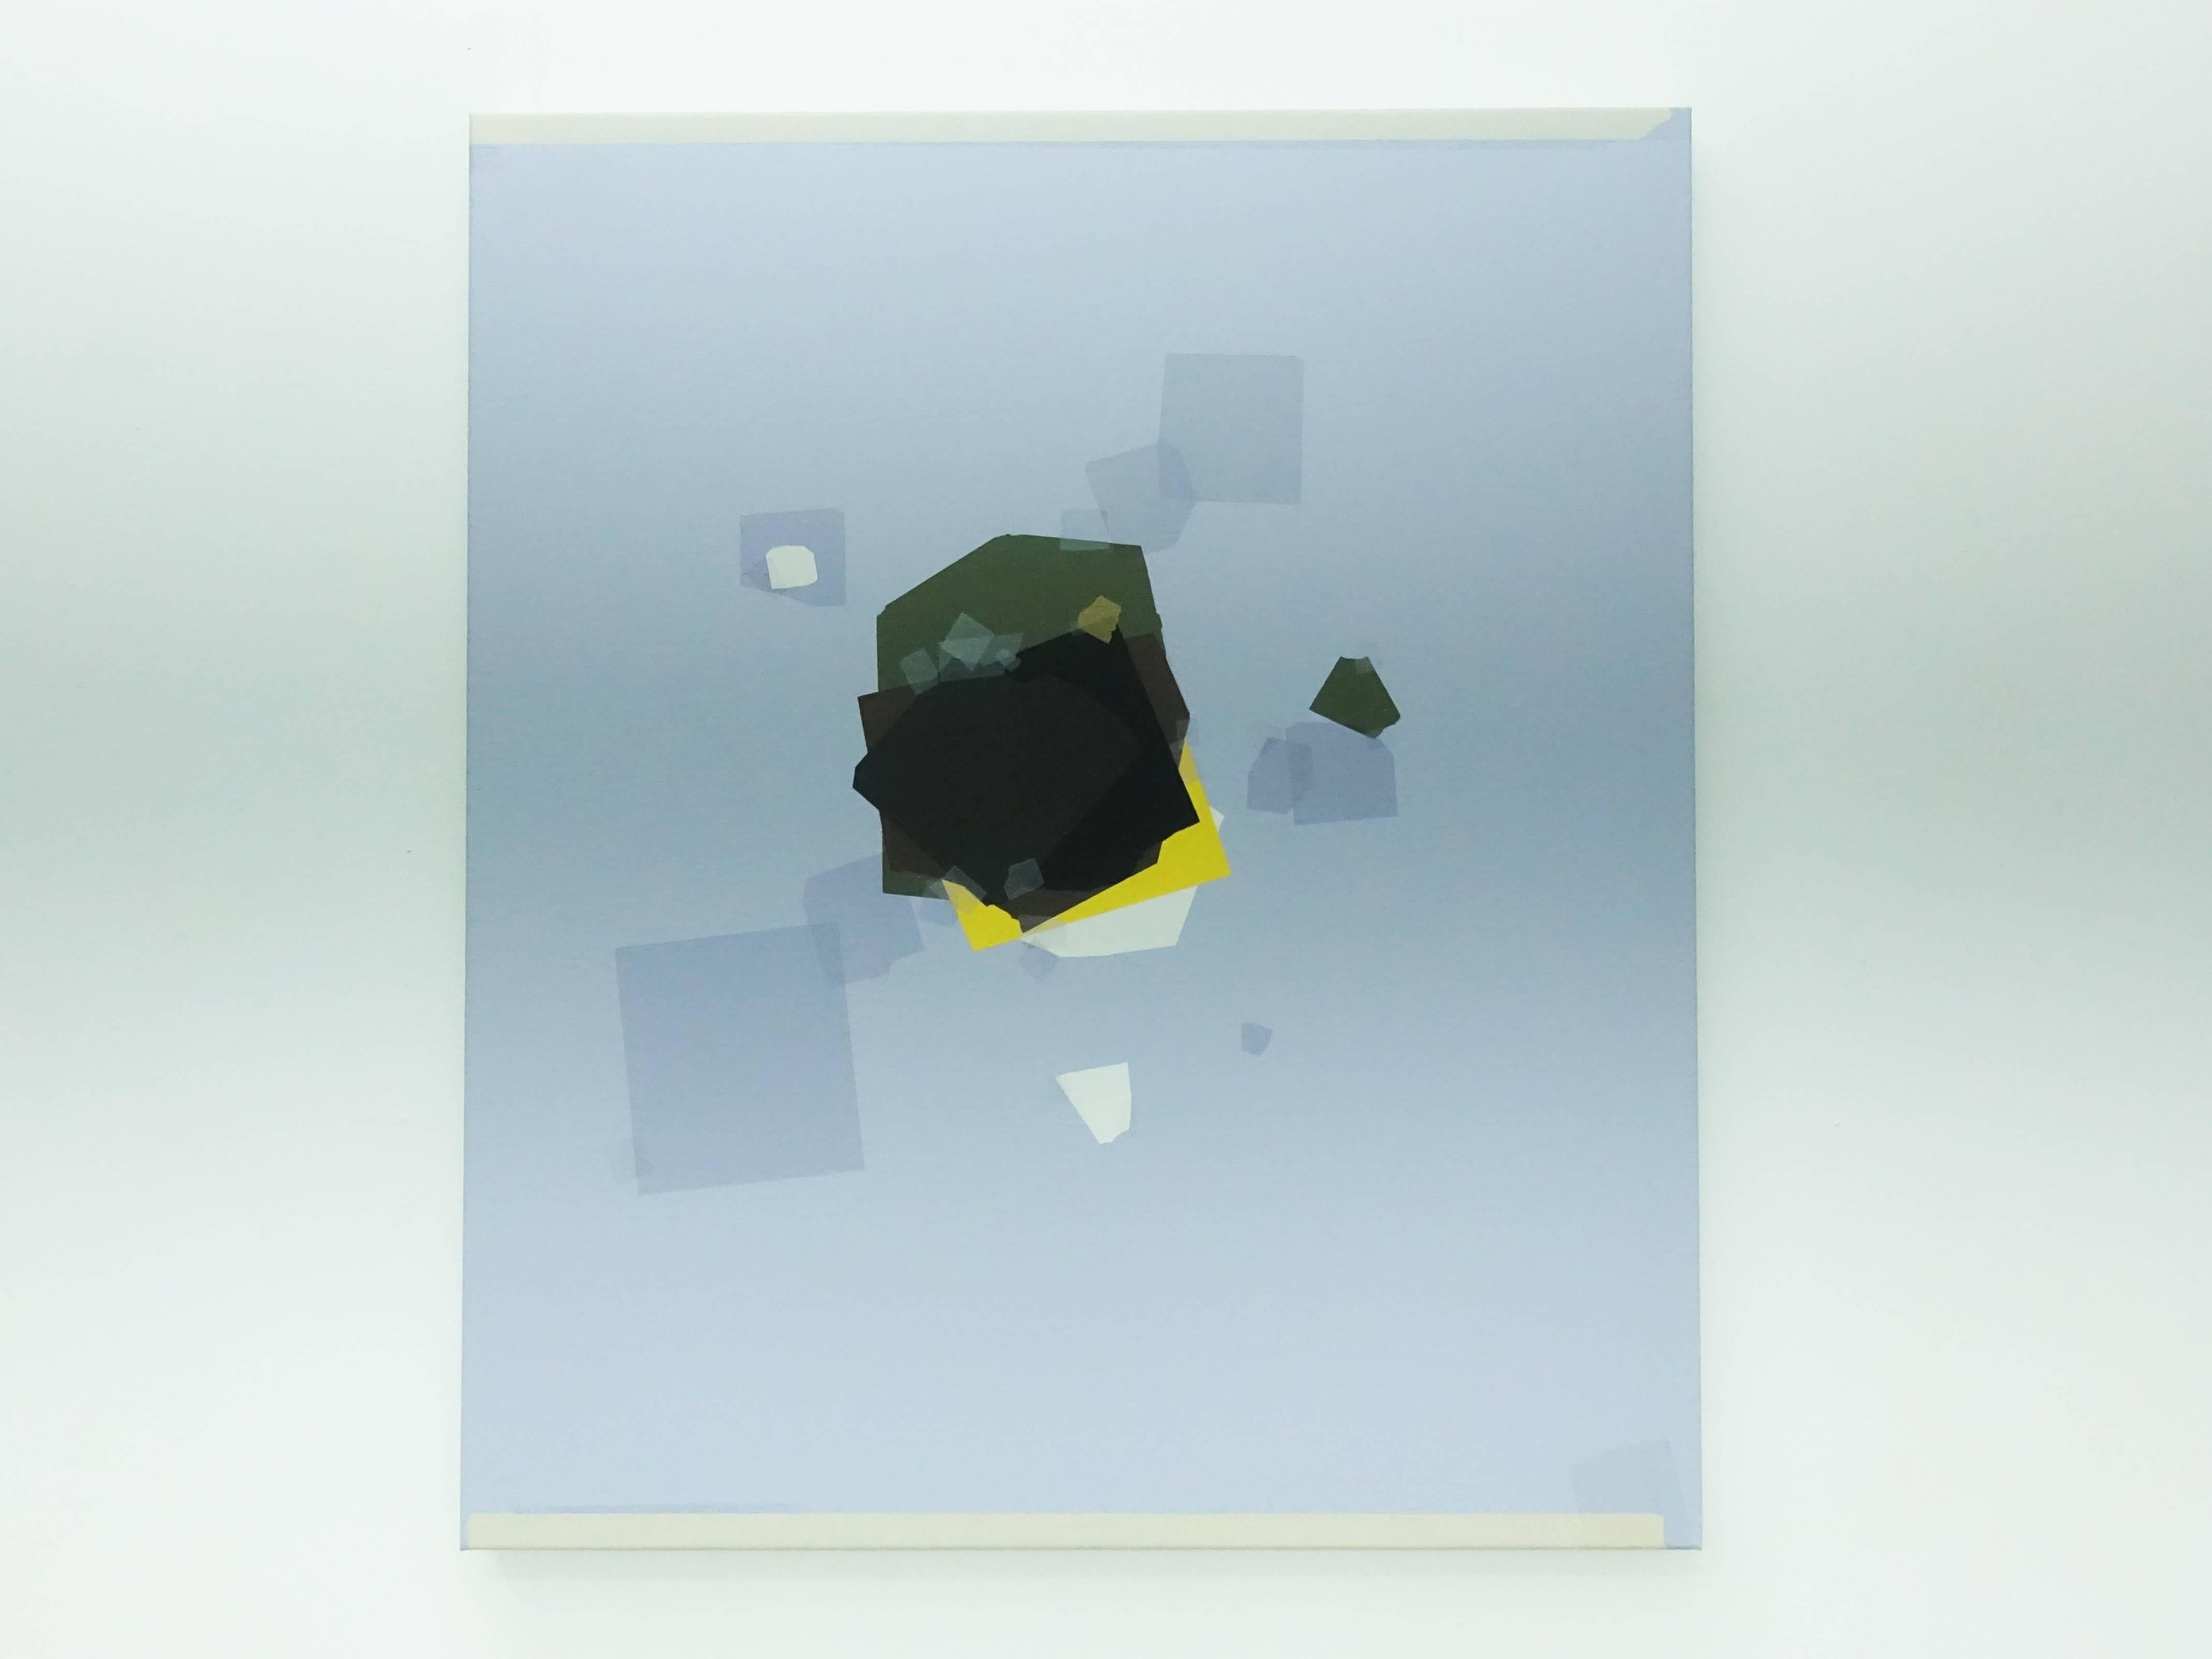 Kees Goudzwaard,《Weightless失重》,Oil on canvas,70 x 60 cm,2019。